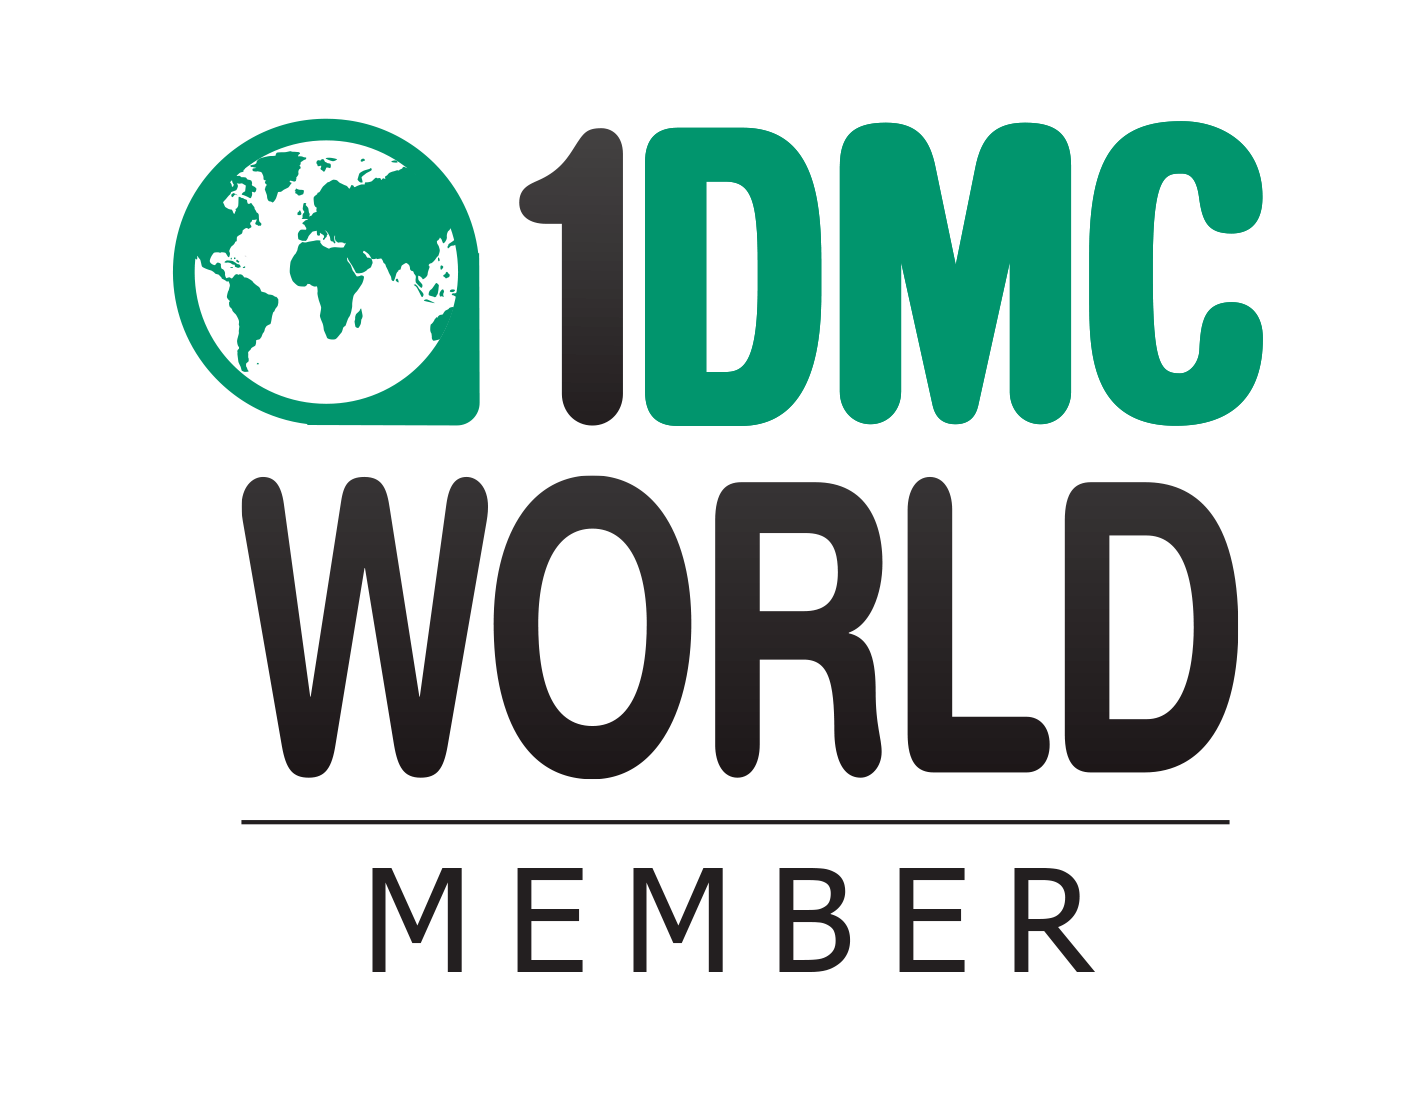 1DMC logo